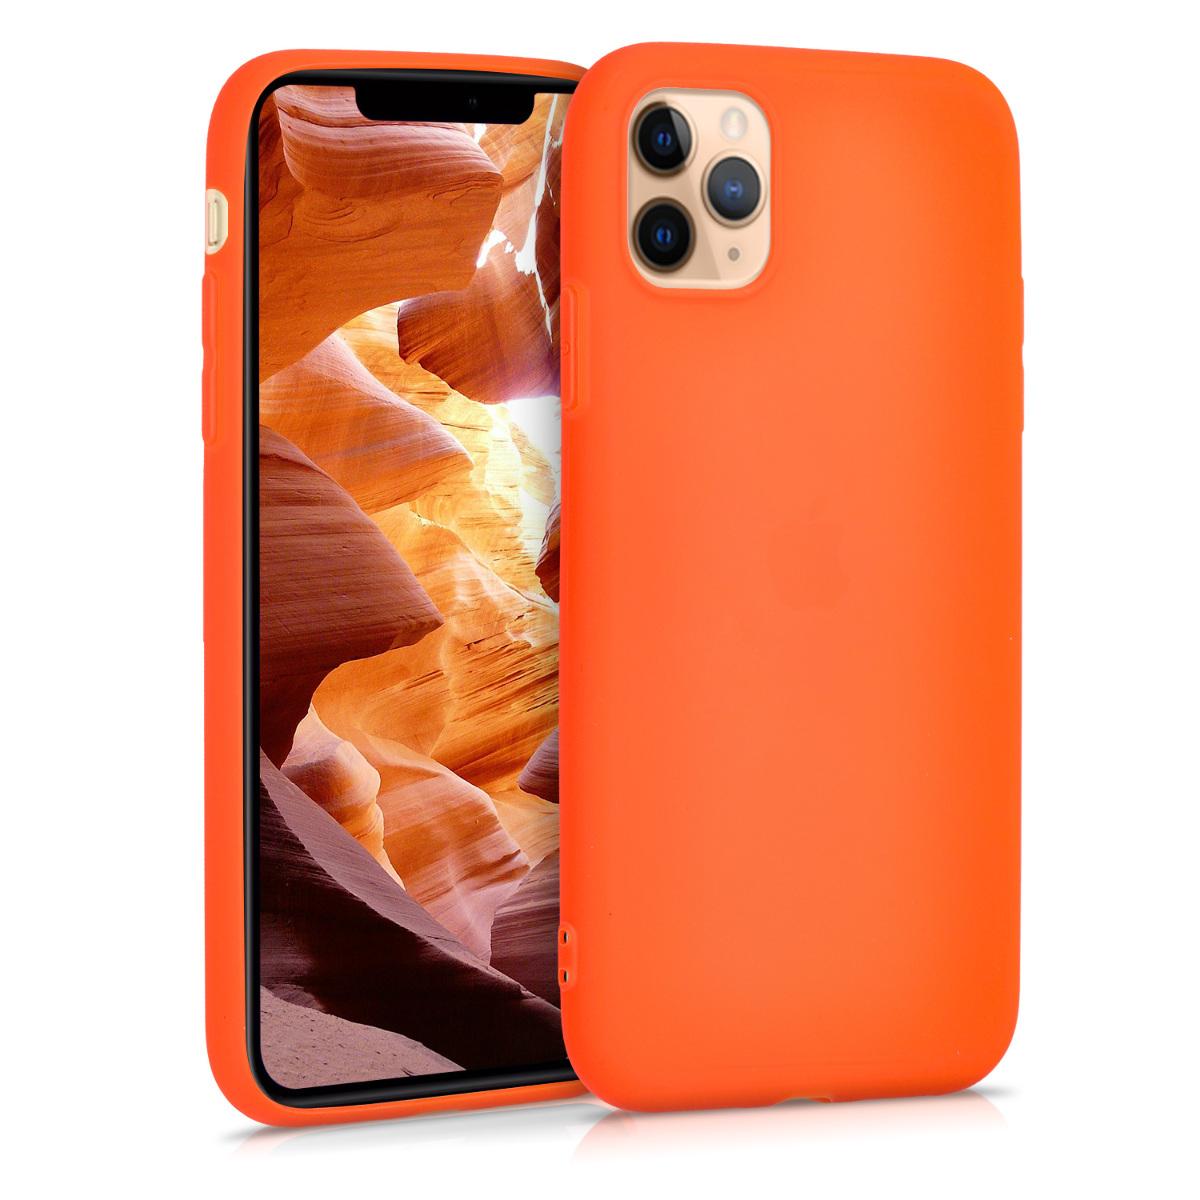 KW Θήκη Σιλικόνης Apple iPhone 11 Pro Max - Neon Orange (49782.69)